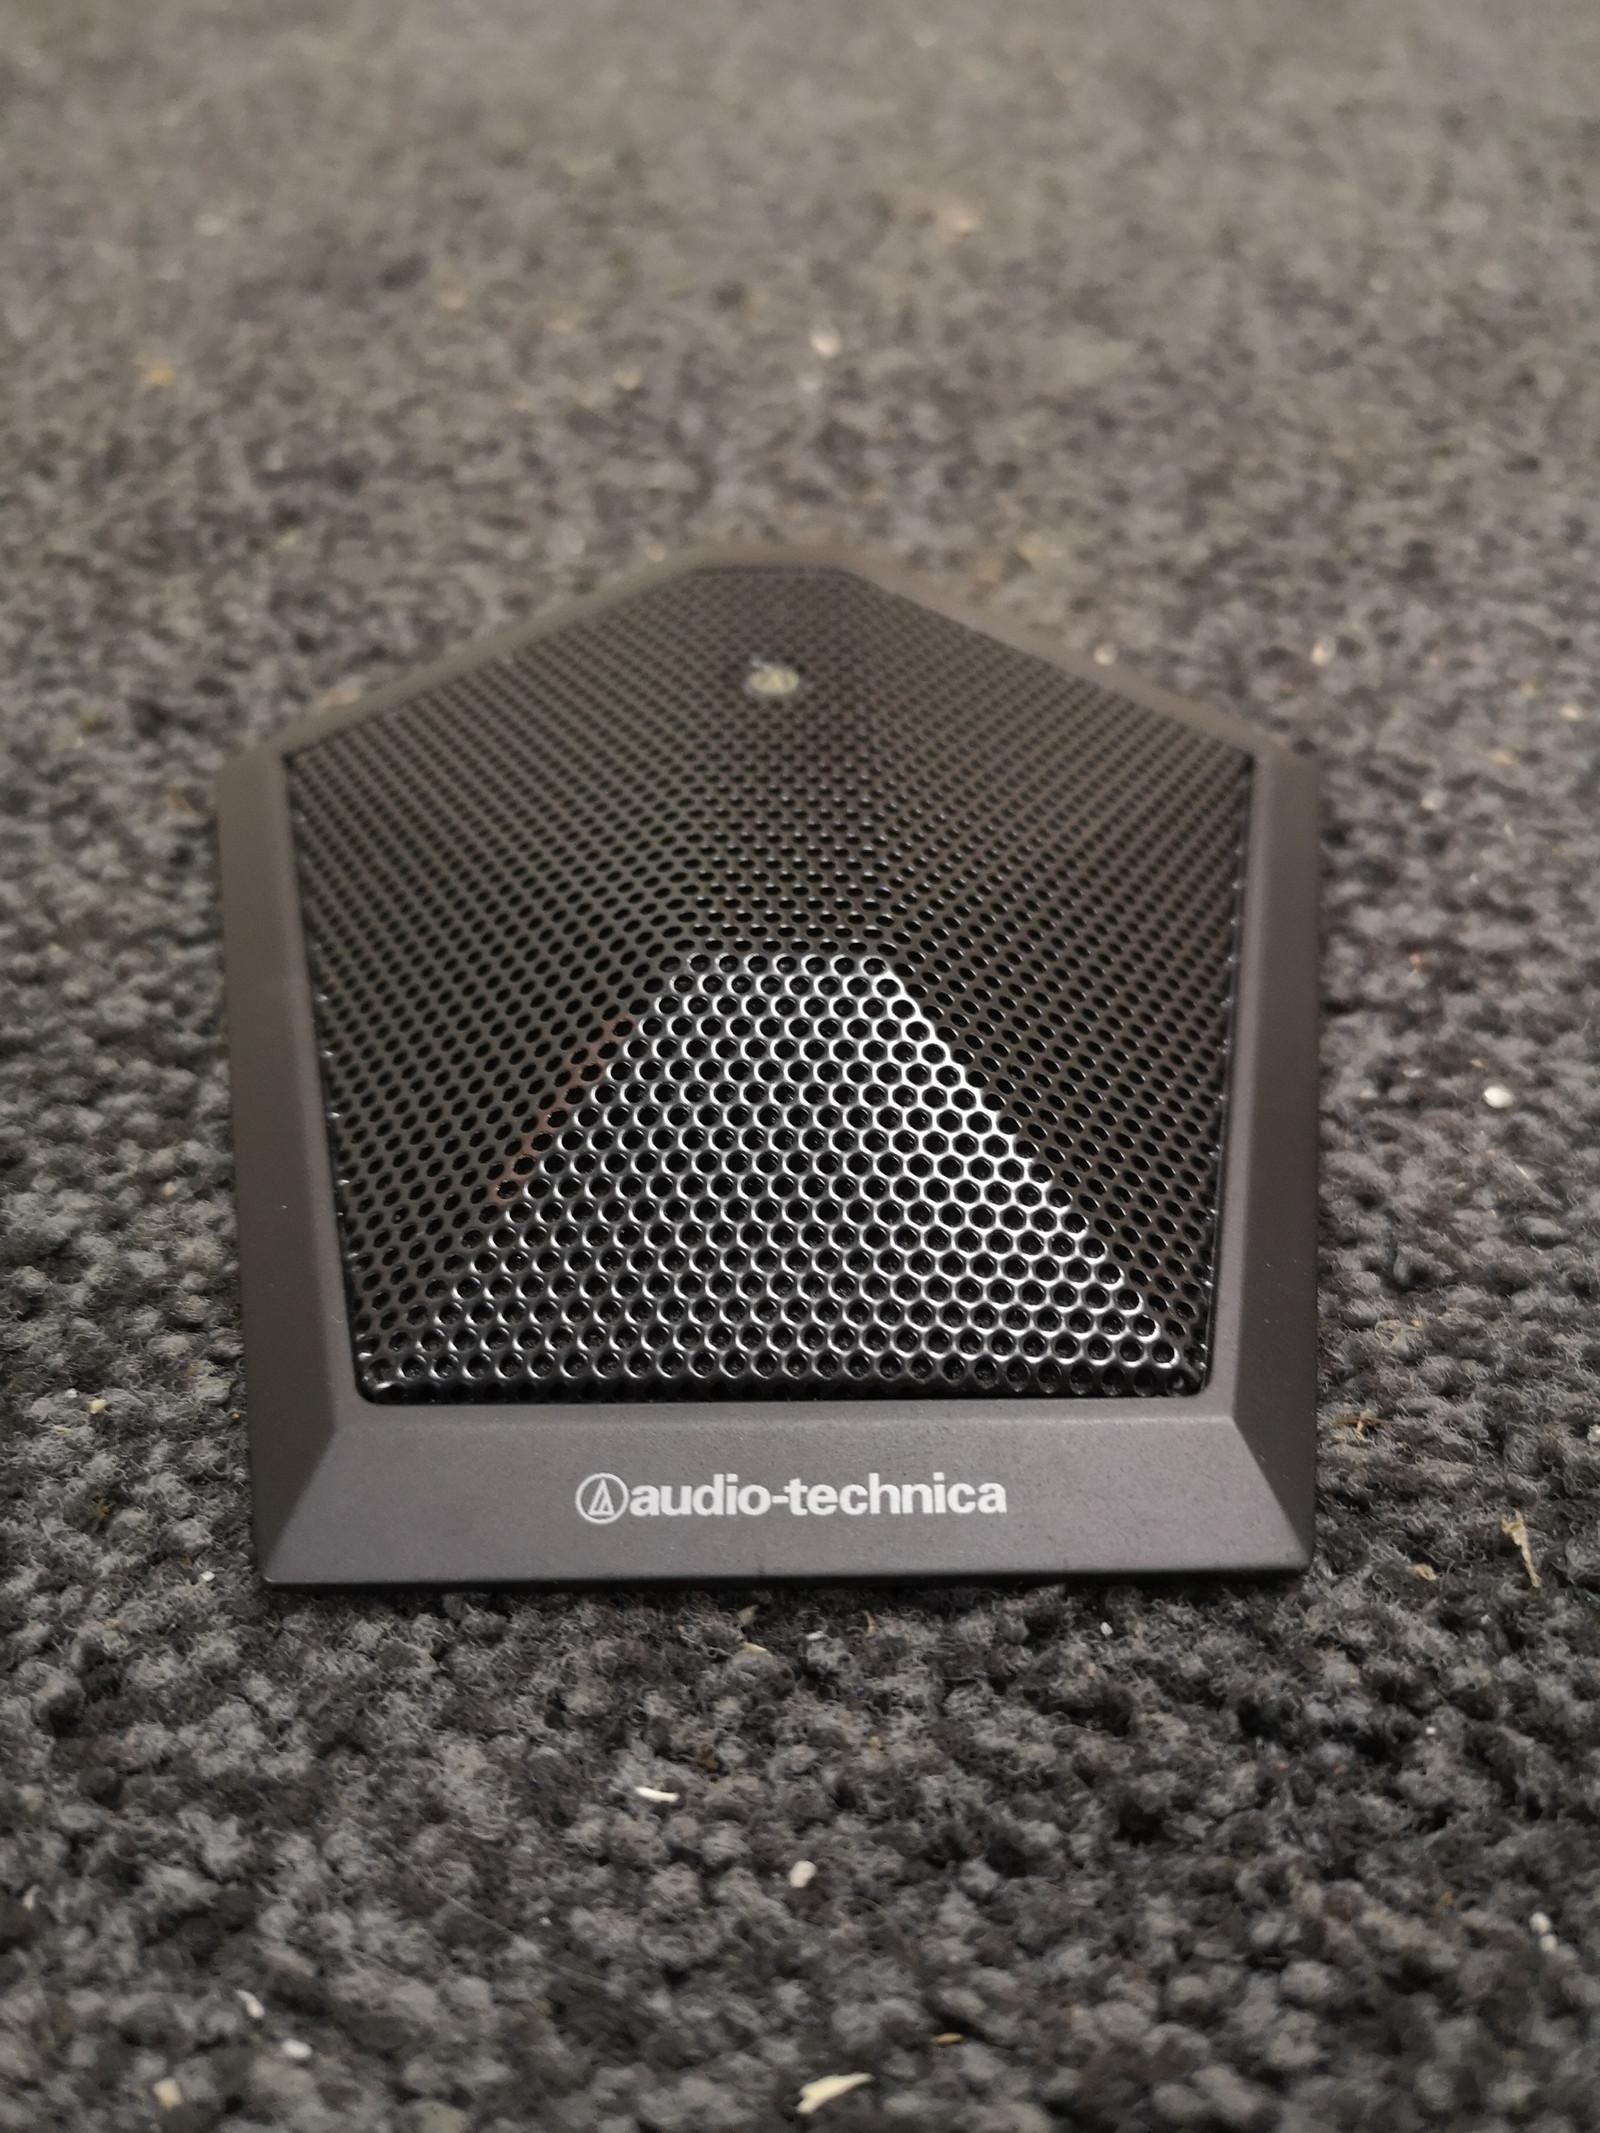 Audio technica AT871UG | FINN.no